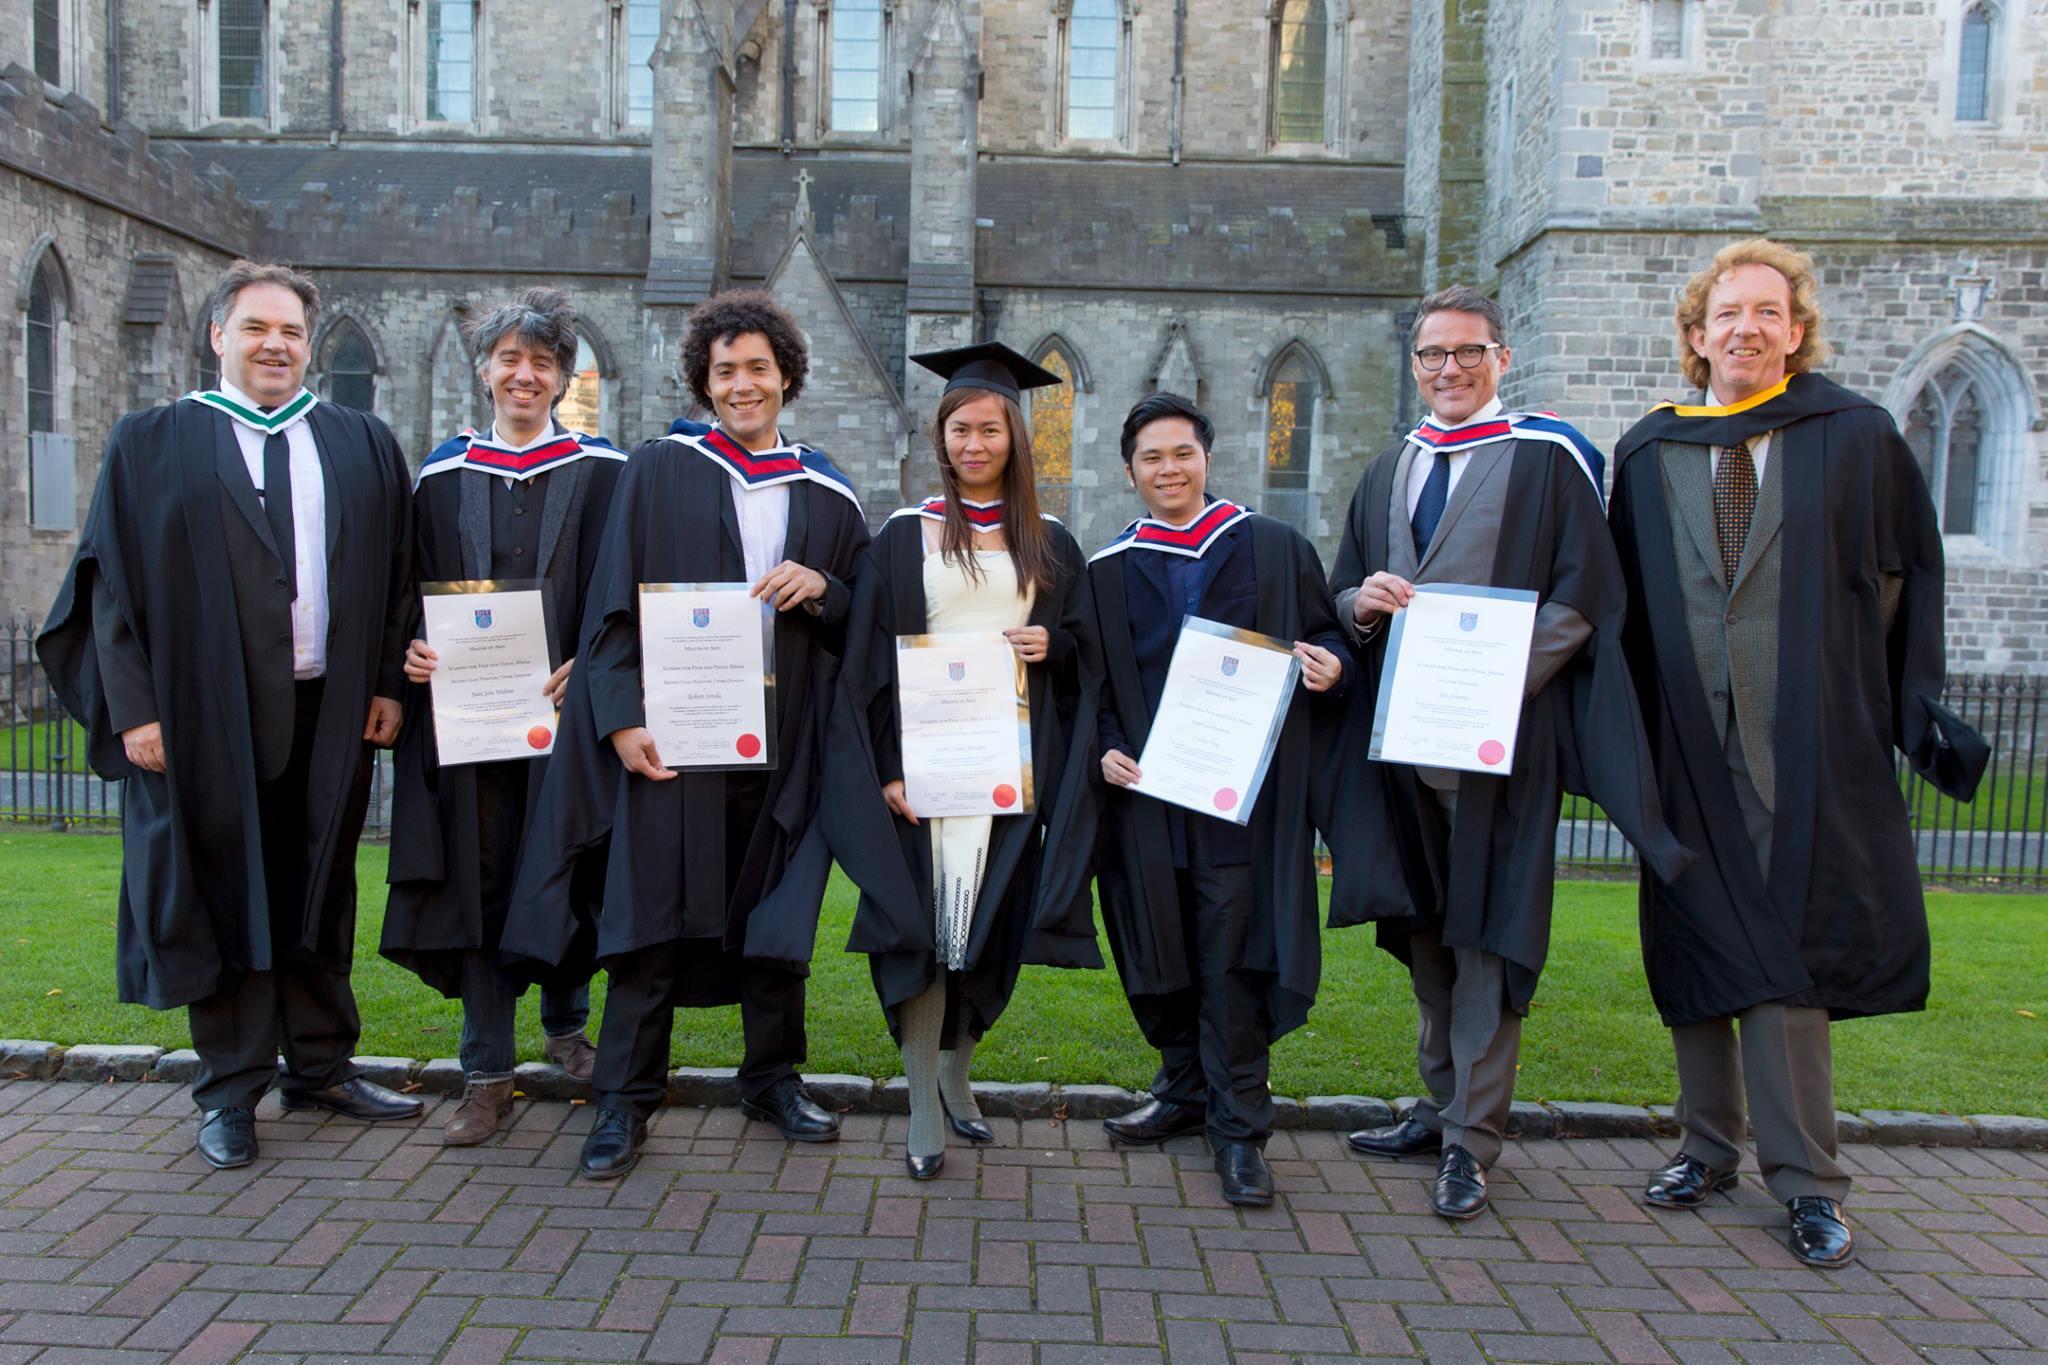 M.A Graduation at St. Patricks Cathedral